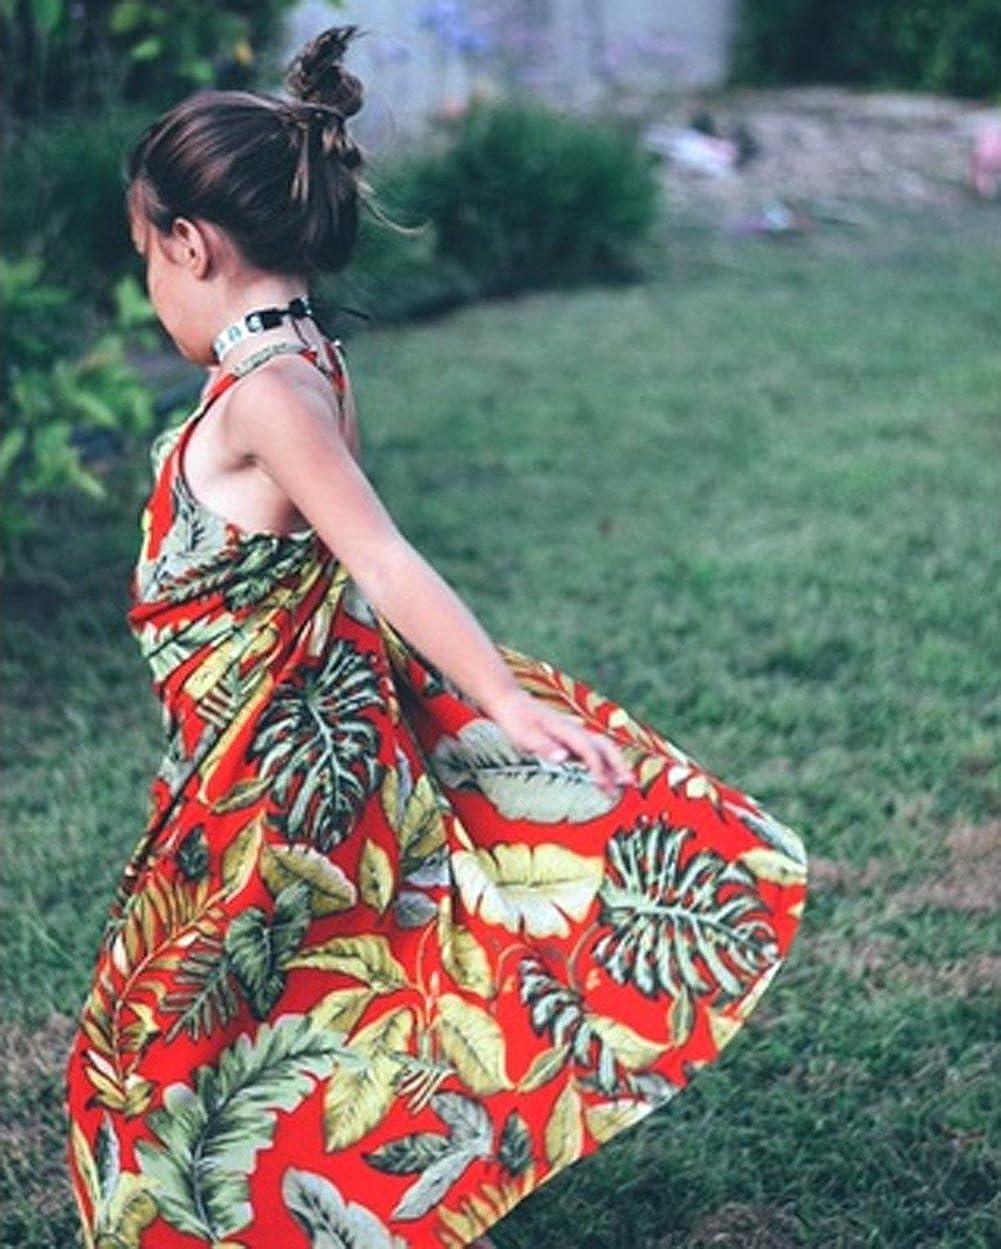 SoftWolf Baby Girls Sleeveless Strap Summer Long Dress,Travel Beach Dress for 1-5 Year